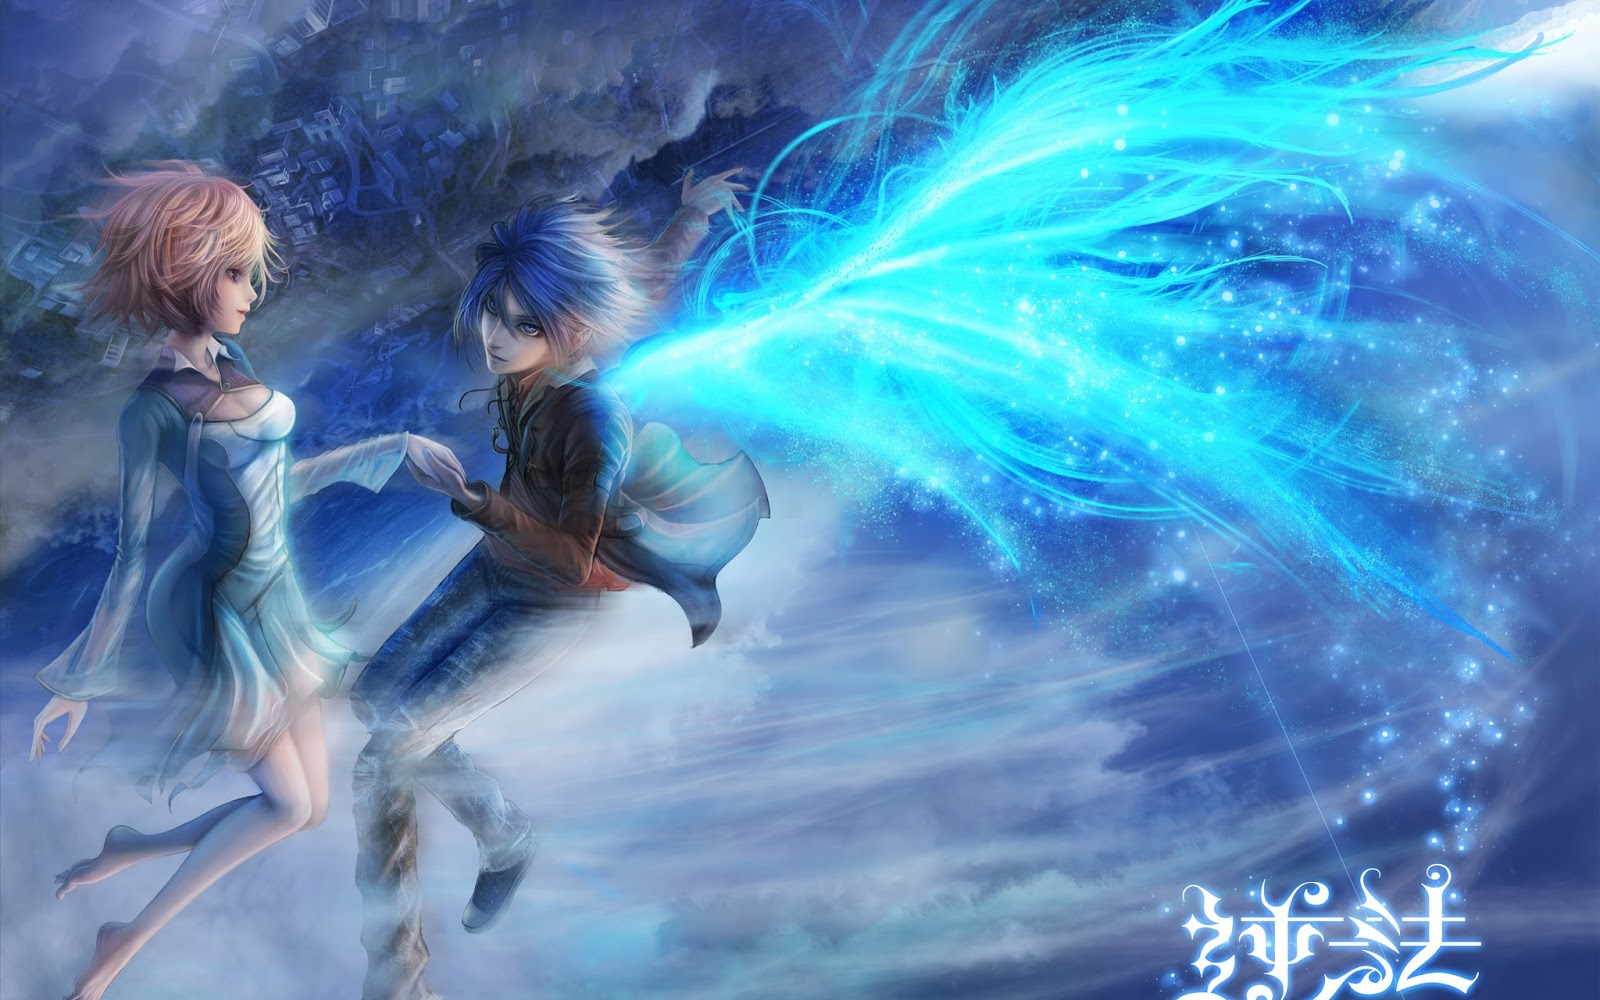 Download Kumpulan Fan Art dan Wallpaper Anime Keren HD ...